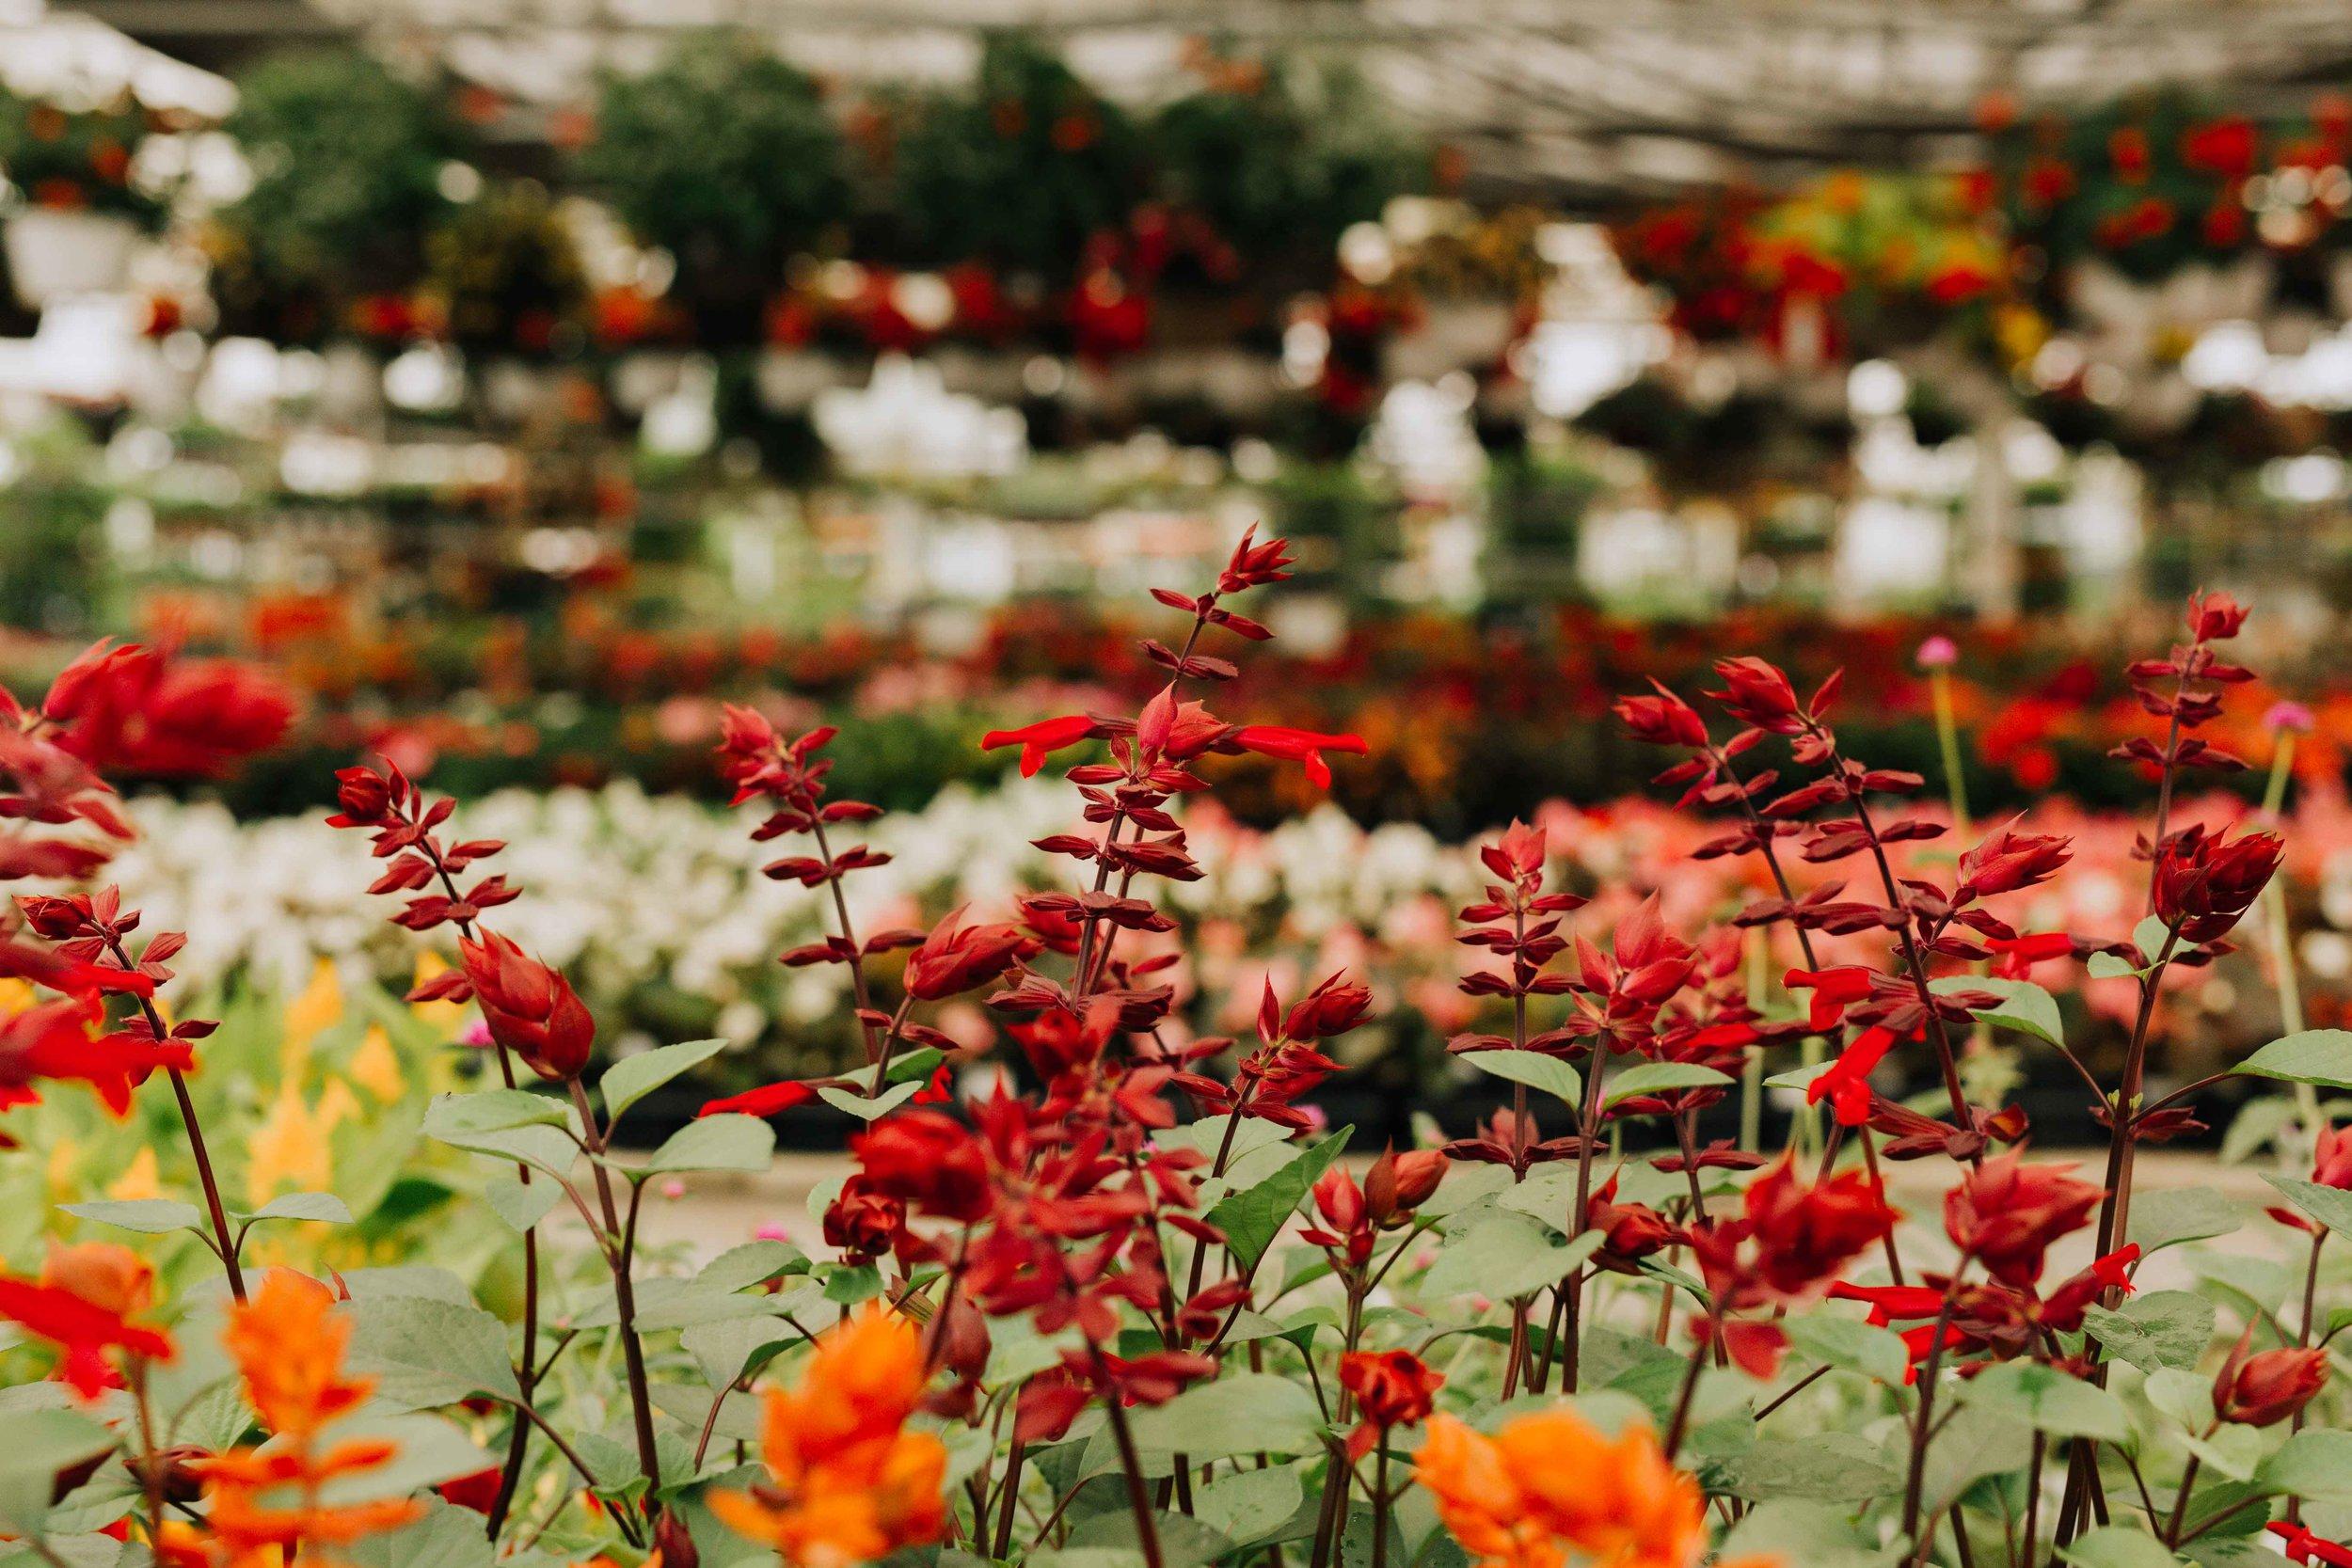 Merrifield-garden-greenhouse-indoor-Jacqueline-Waters-Photography-Red-dress-family- (285).jpg